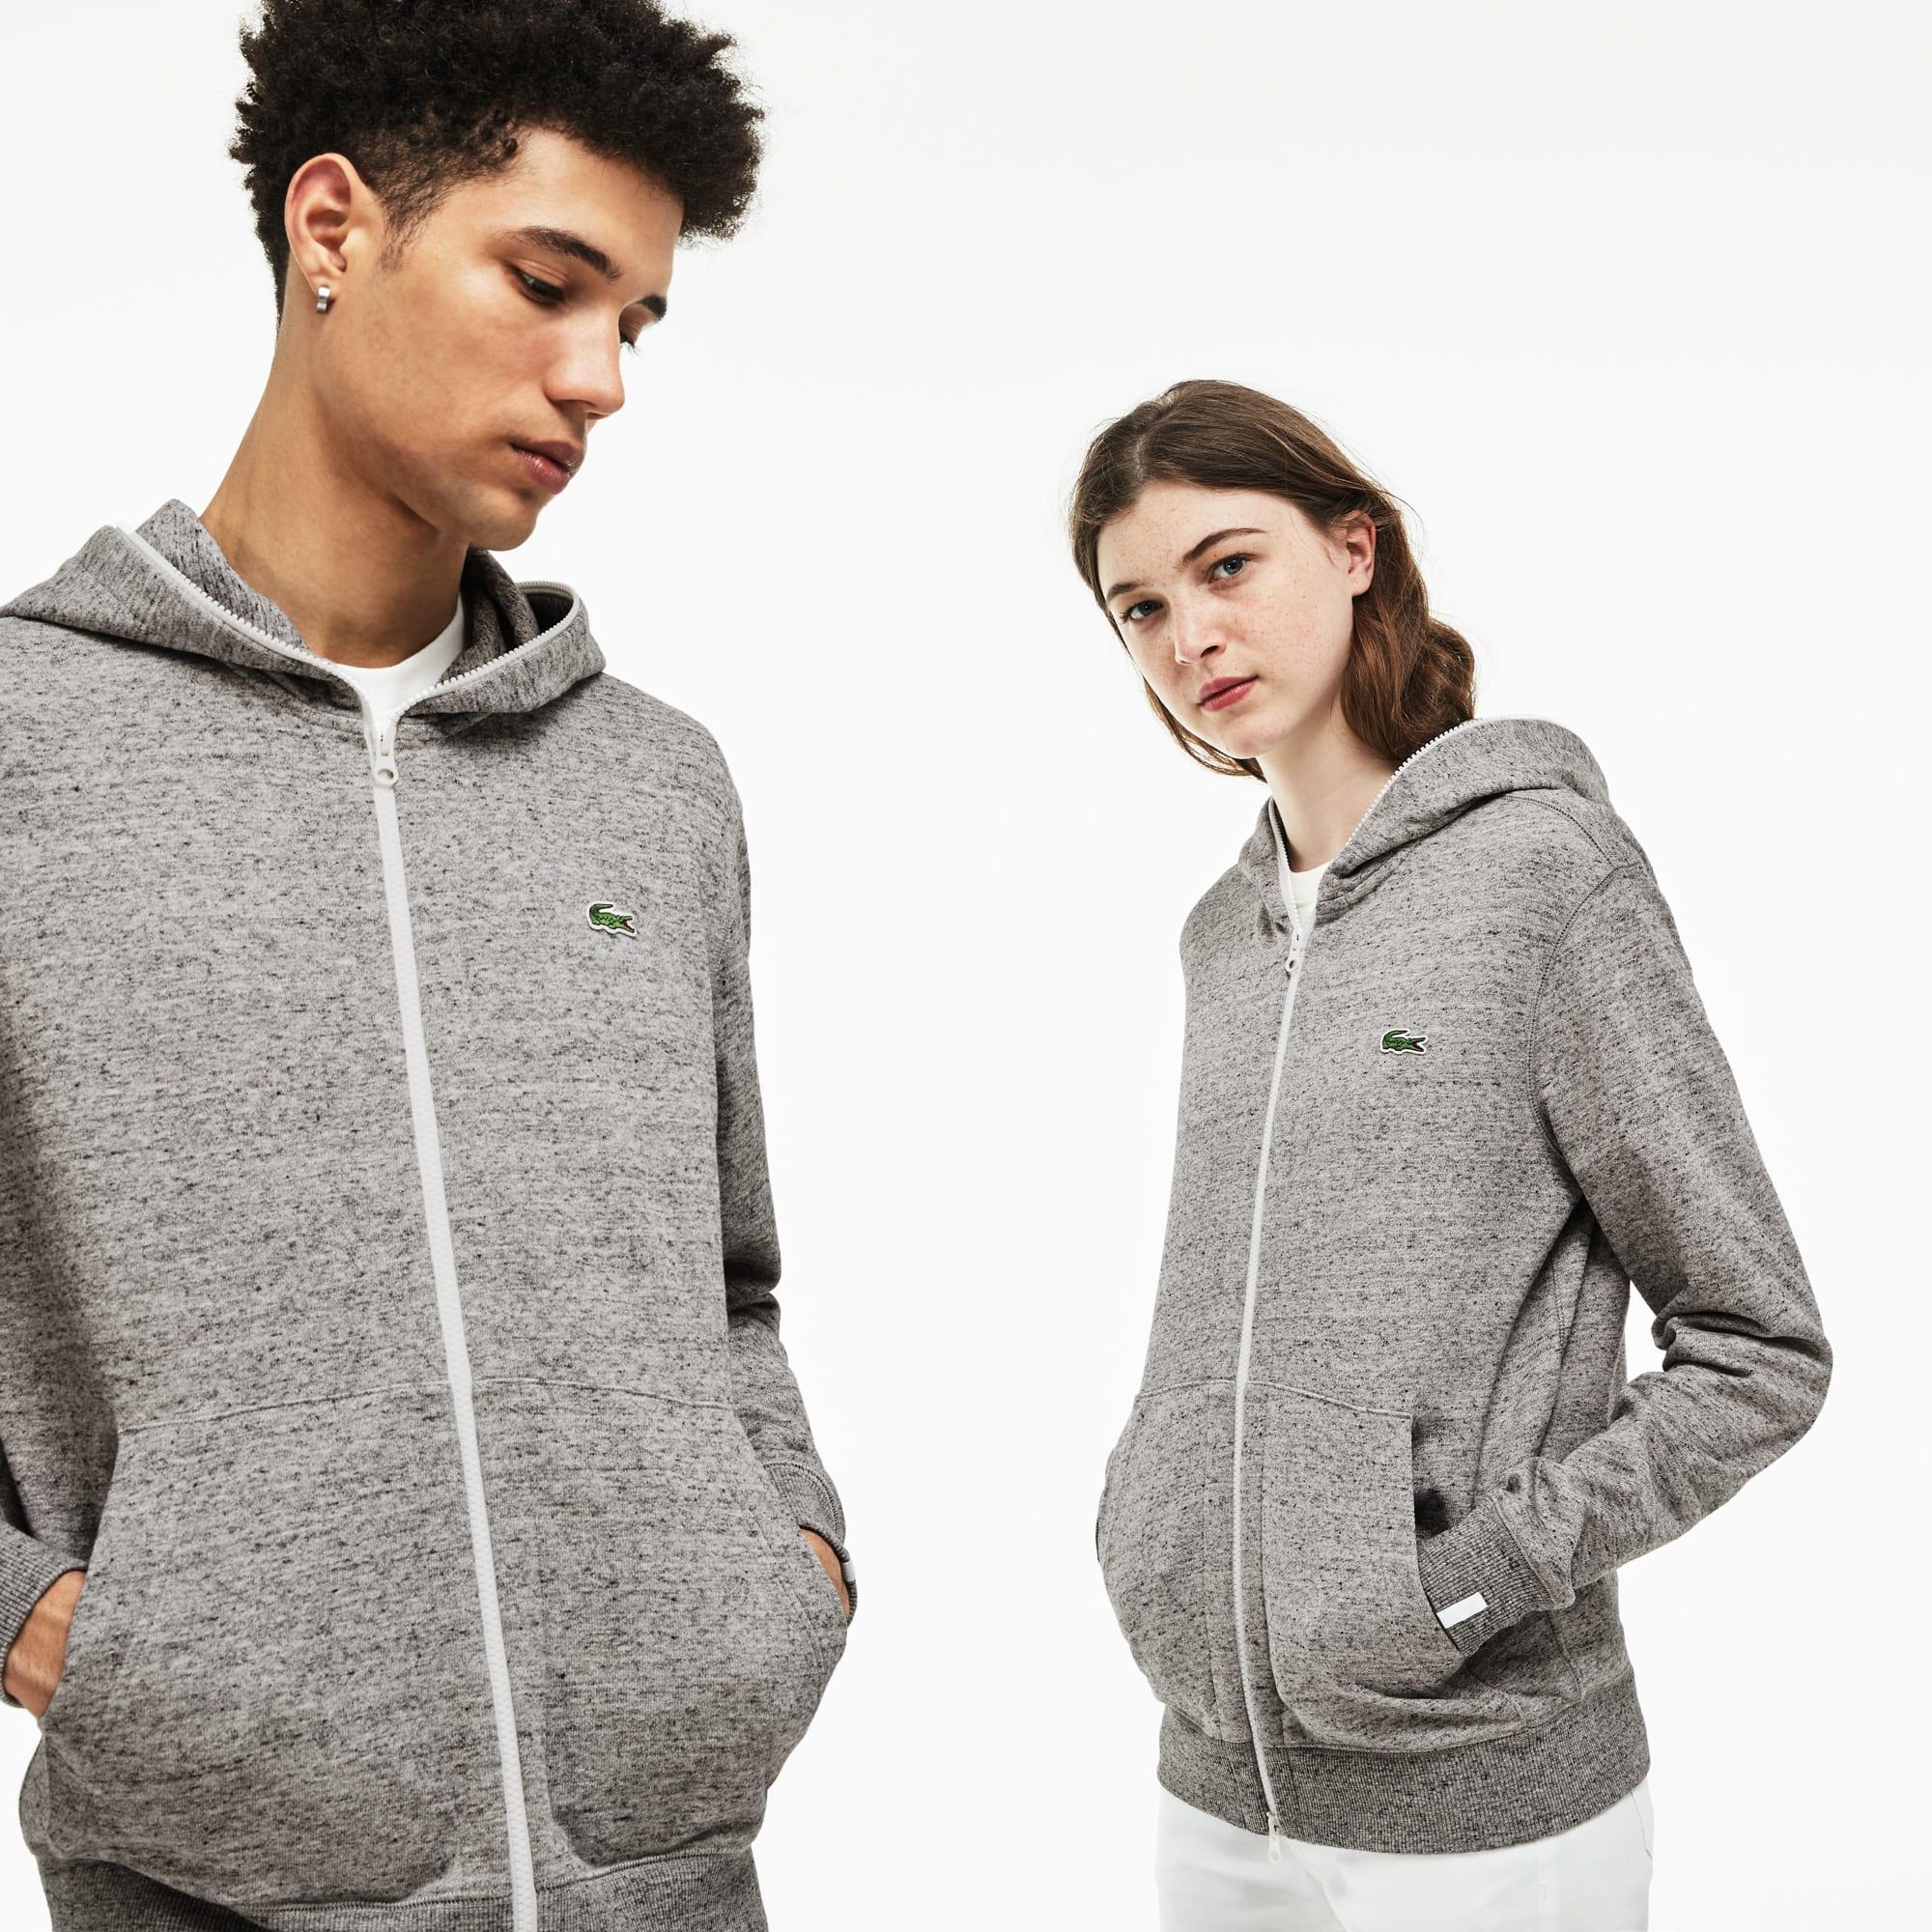 ec28dc95c2402 Men s Sweaters